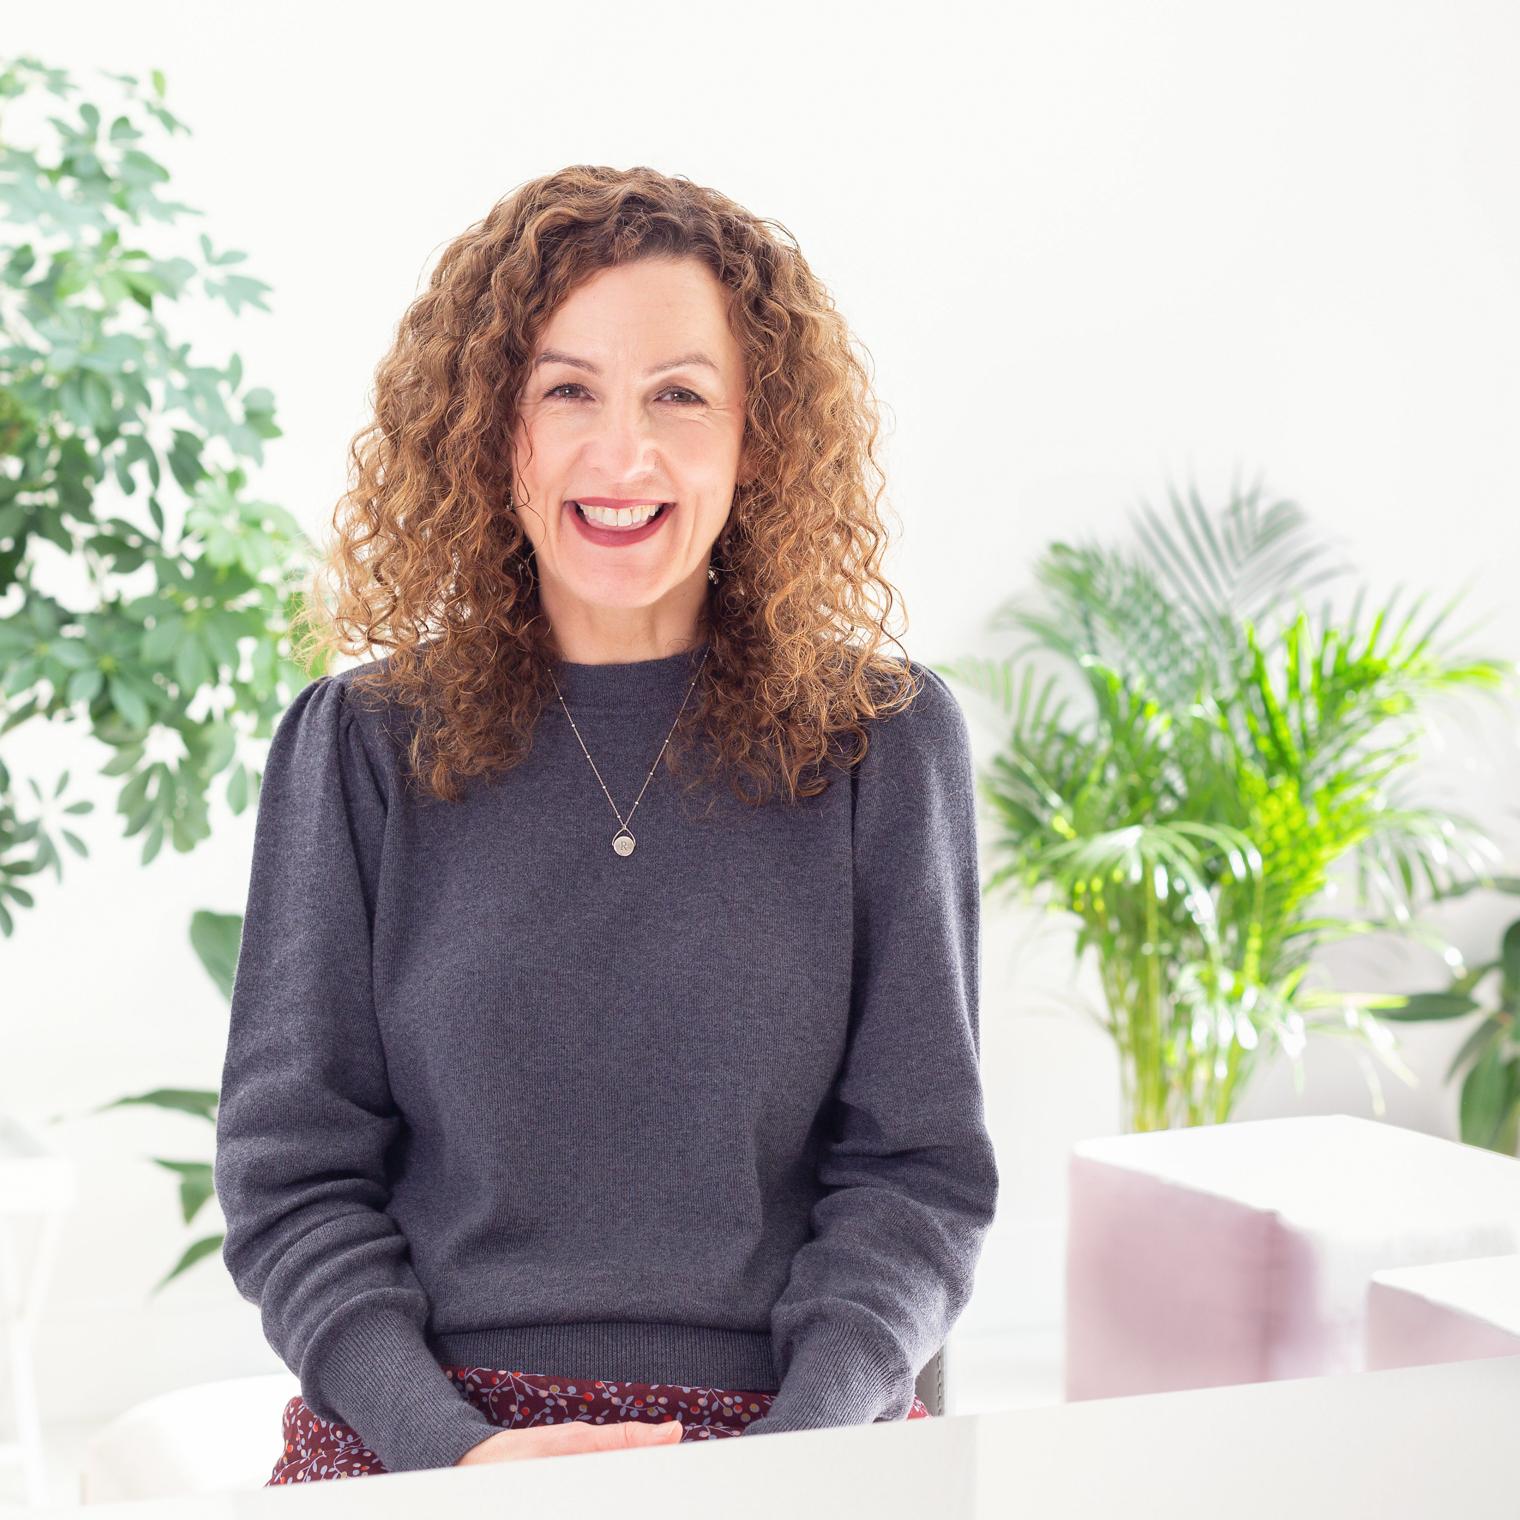 Rona Wheeldon Flowerona - Interview on Floralkin - Floristry Blog - Instagram for Florists Online Course